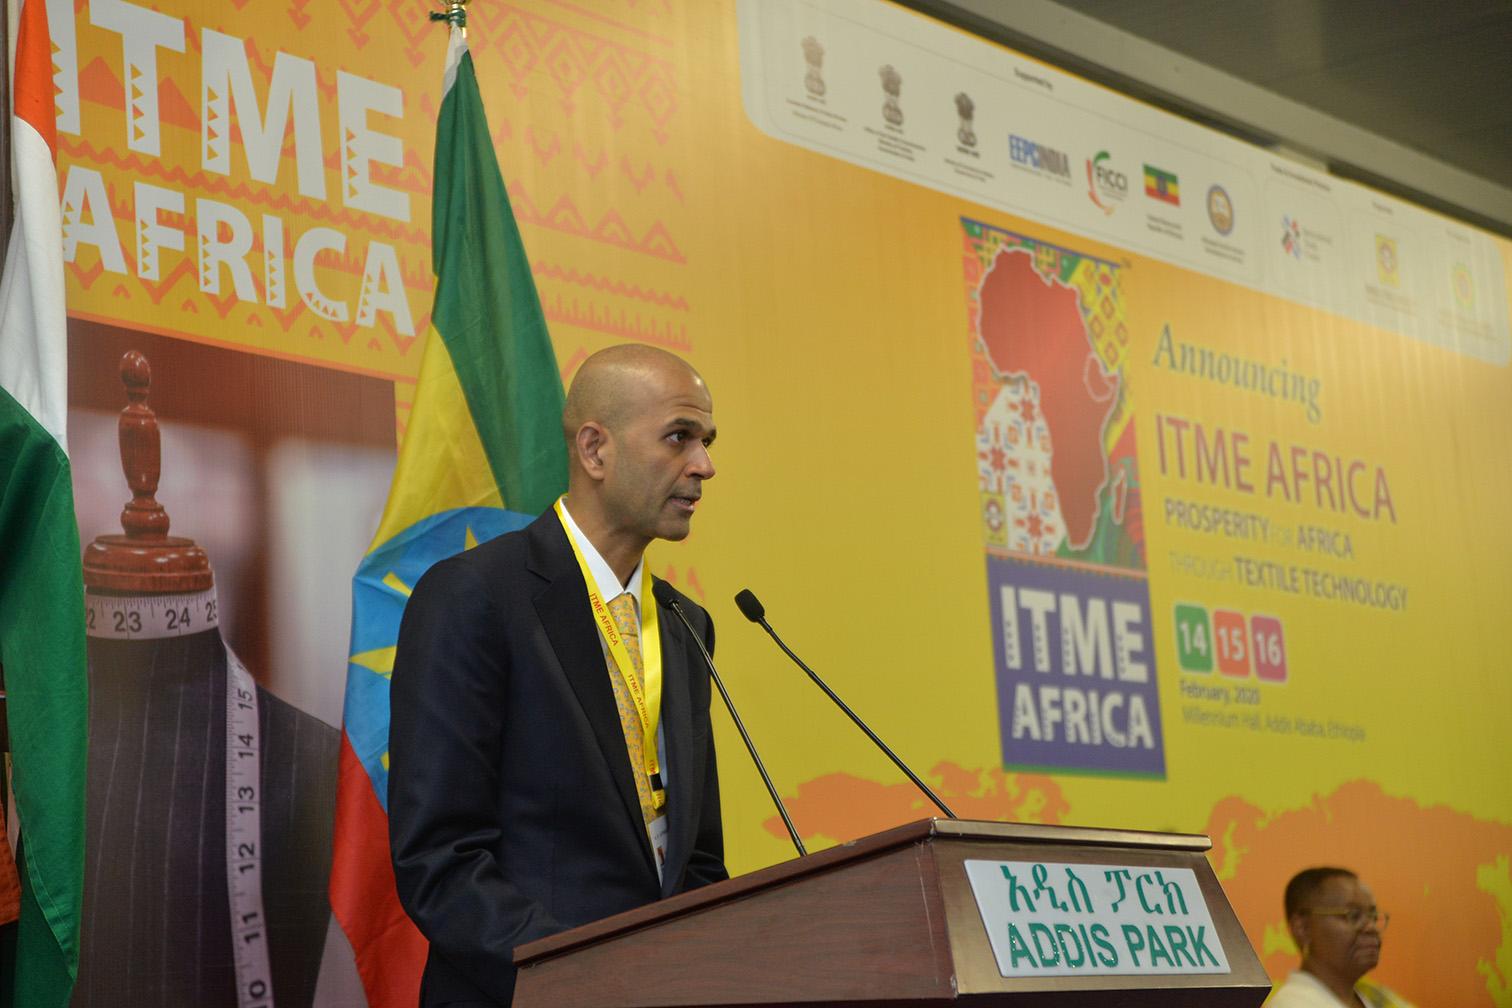 ITME AFRICA 2020